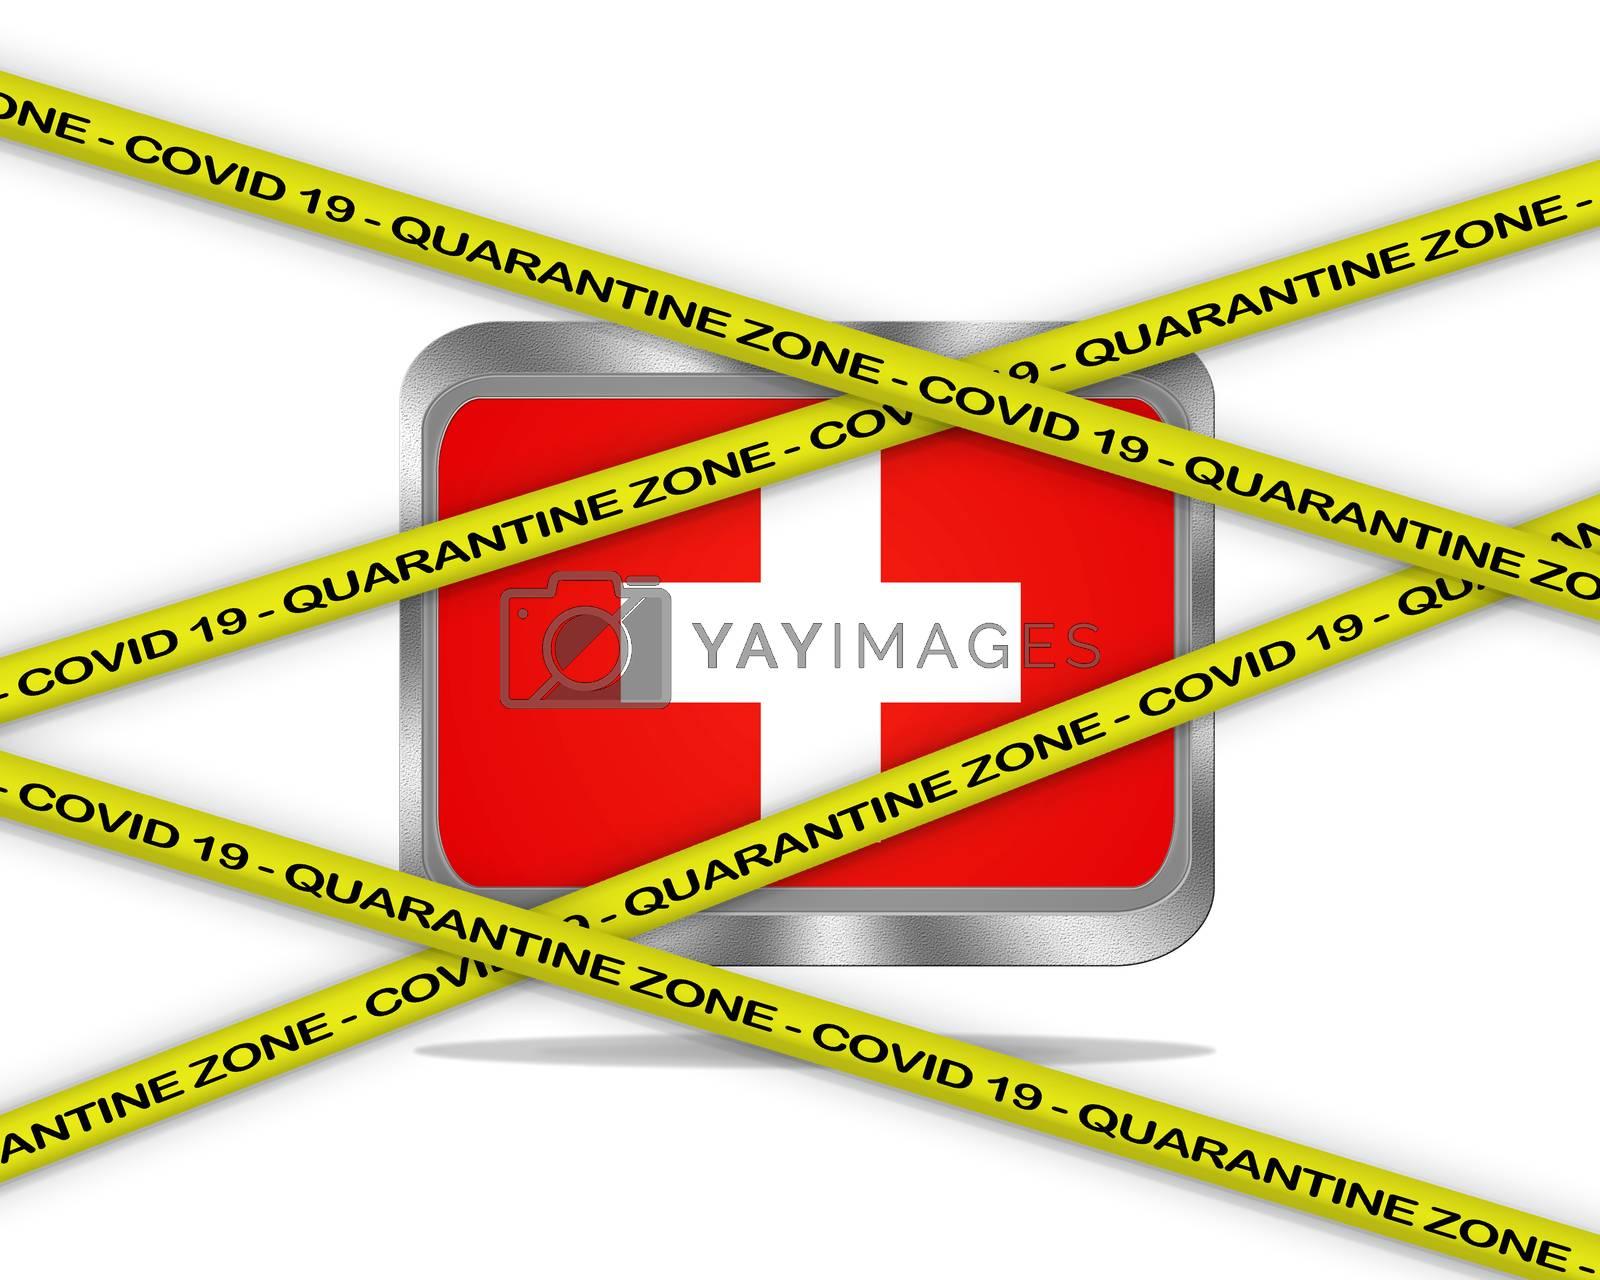 COVID-19 warning yellow ribbon written with: Quarantine zone Cover 19 on Switzerland flag illustration. Coronavirus danger area, quarantined country.